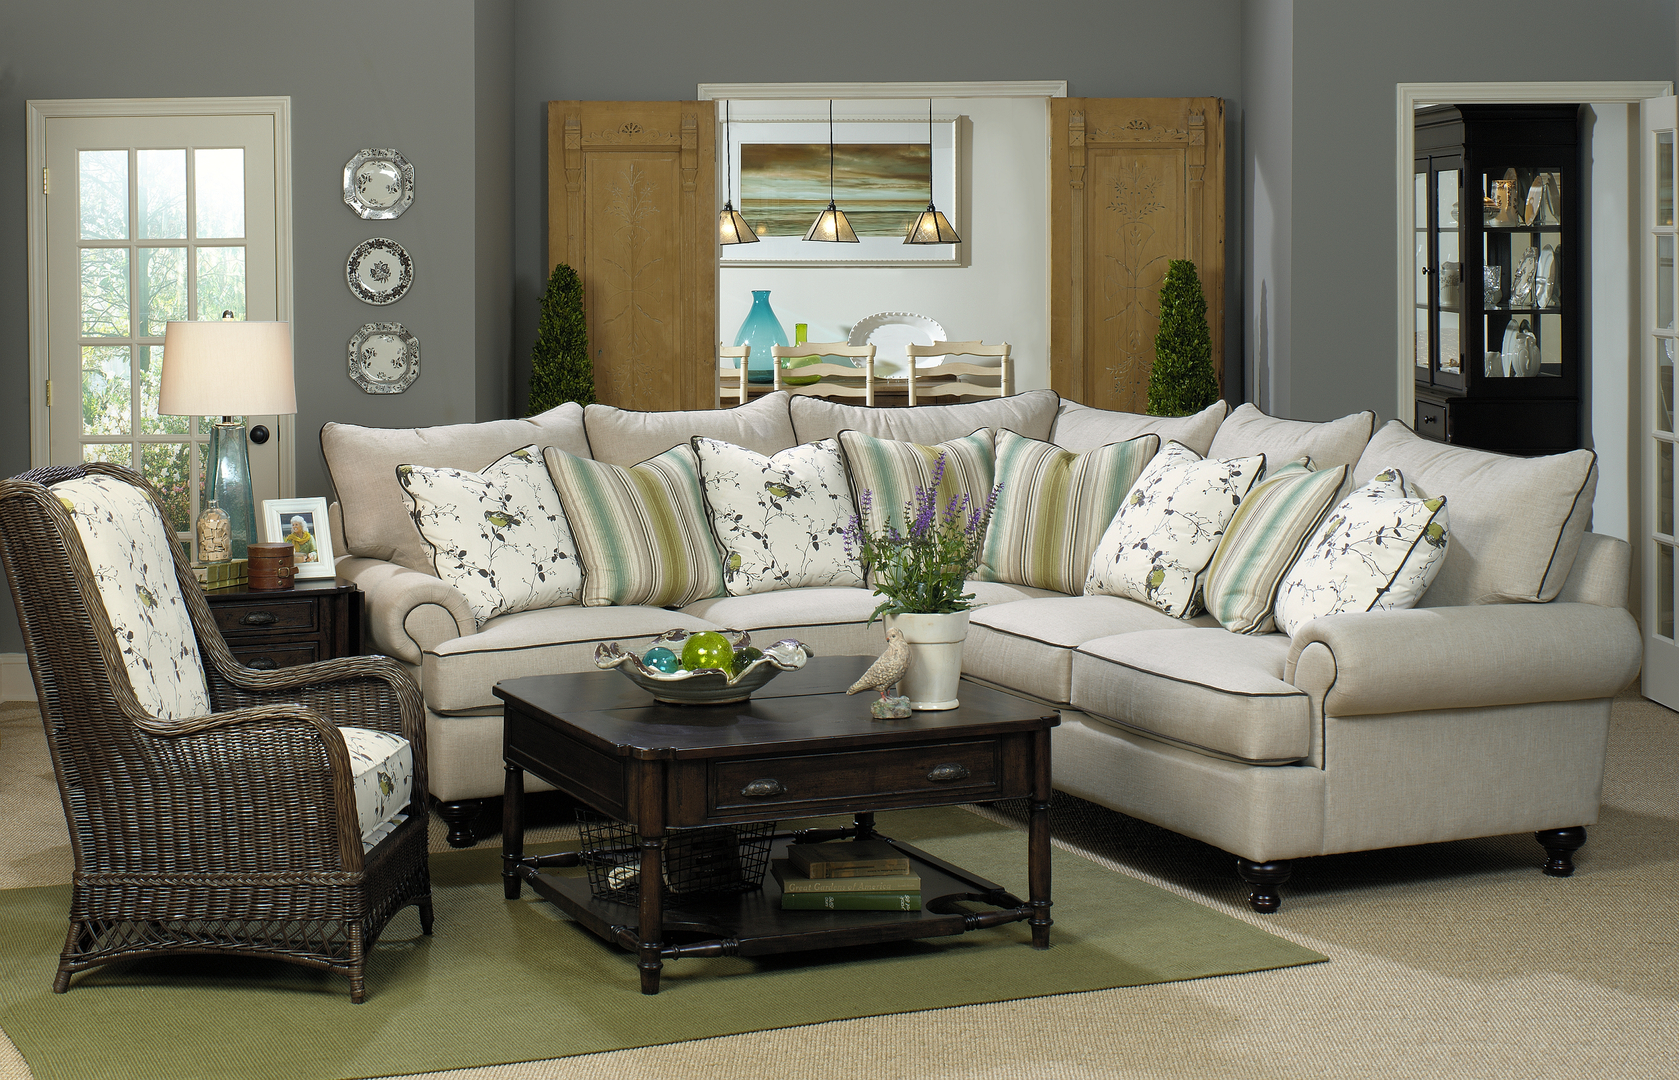 Sofa Creations In Richmond Va - Sofa design richmond va